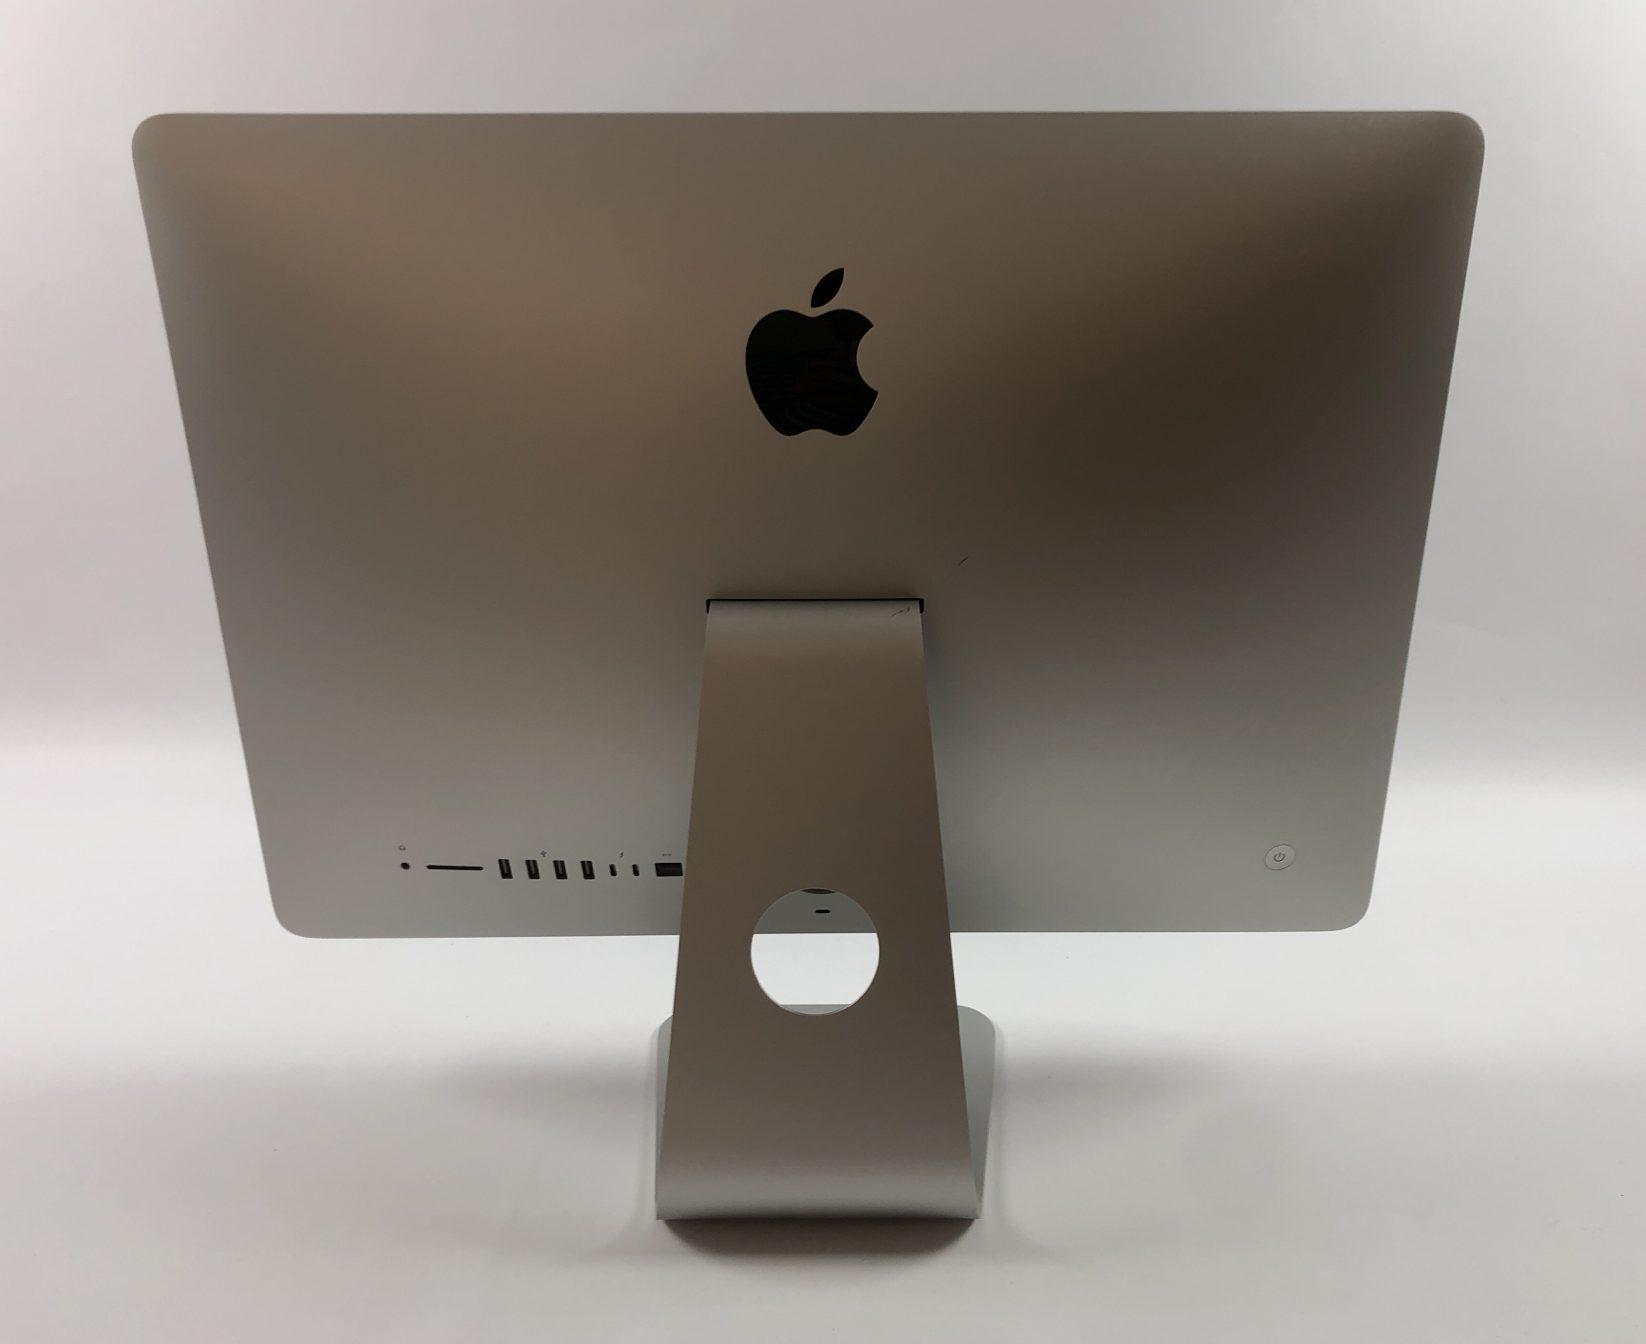 "iMac 21.5"" Mid 2017 (Intel Core i5 2.3 GHz 8 GB RAM 1 TB HDD), Intel Core i5 2.3 GHz, 8 GB RAM, 1 TB HDD, imagen 2"